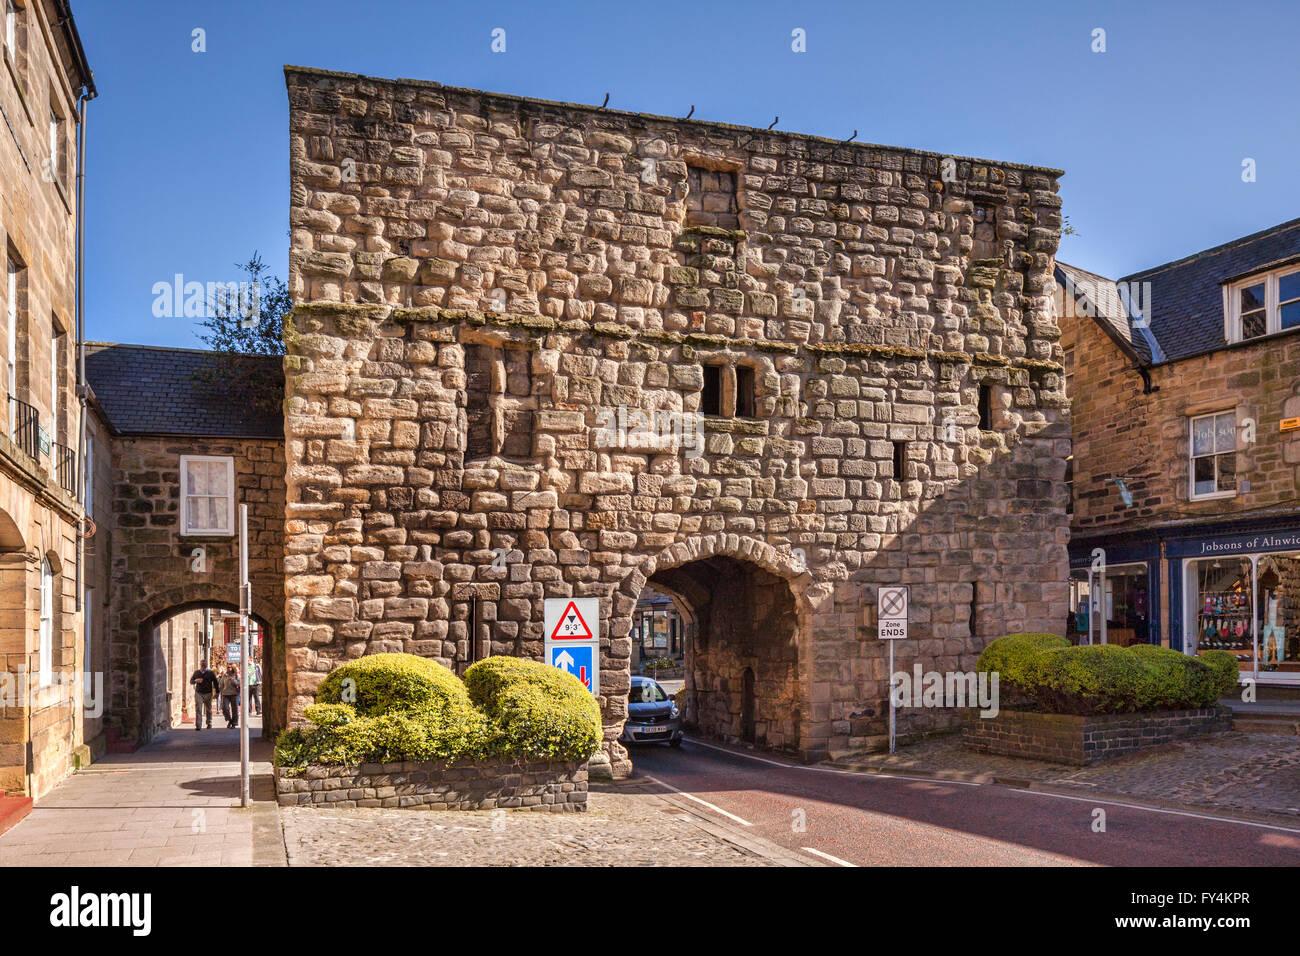 The 15th century Bondgate Tower, Alnwick, Northumberland, England, UK - Stock Image